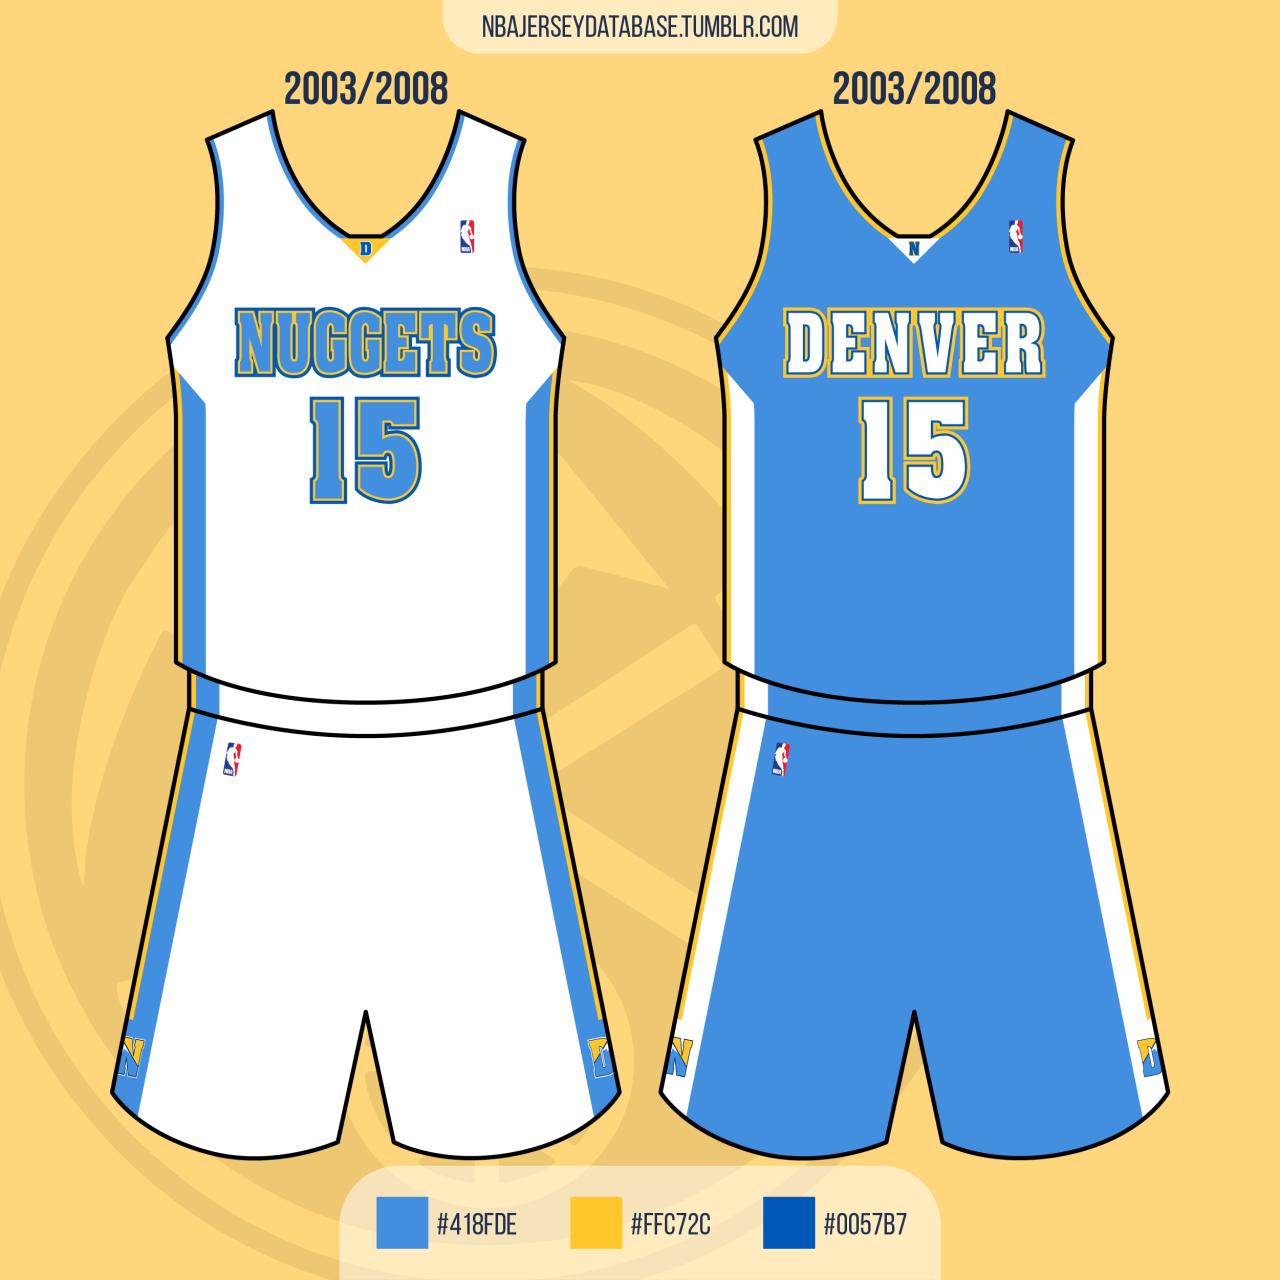 Denver Nuggets 2003-2008 Record: 231-179 (56%) #nba#basketball#jersey#Denver Nuggets